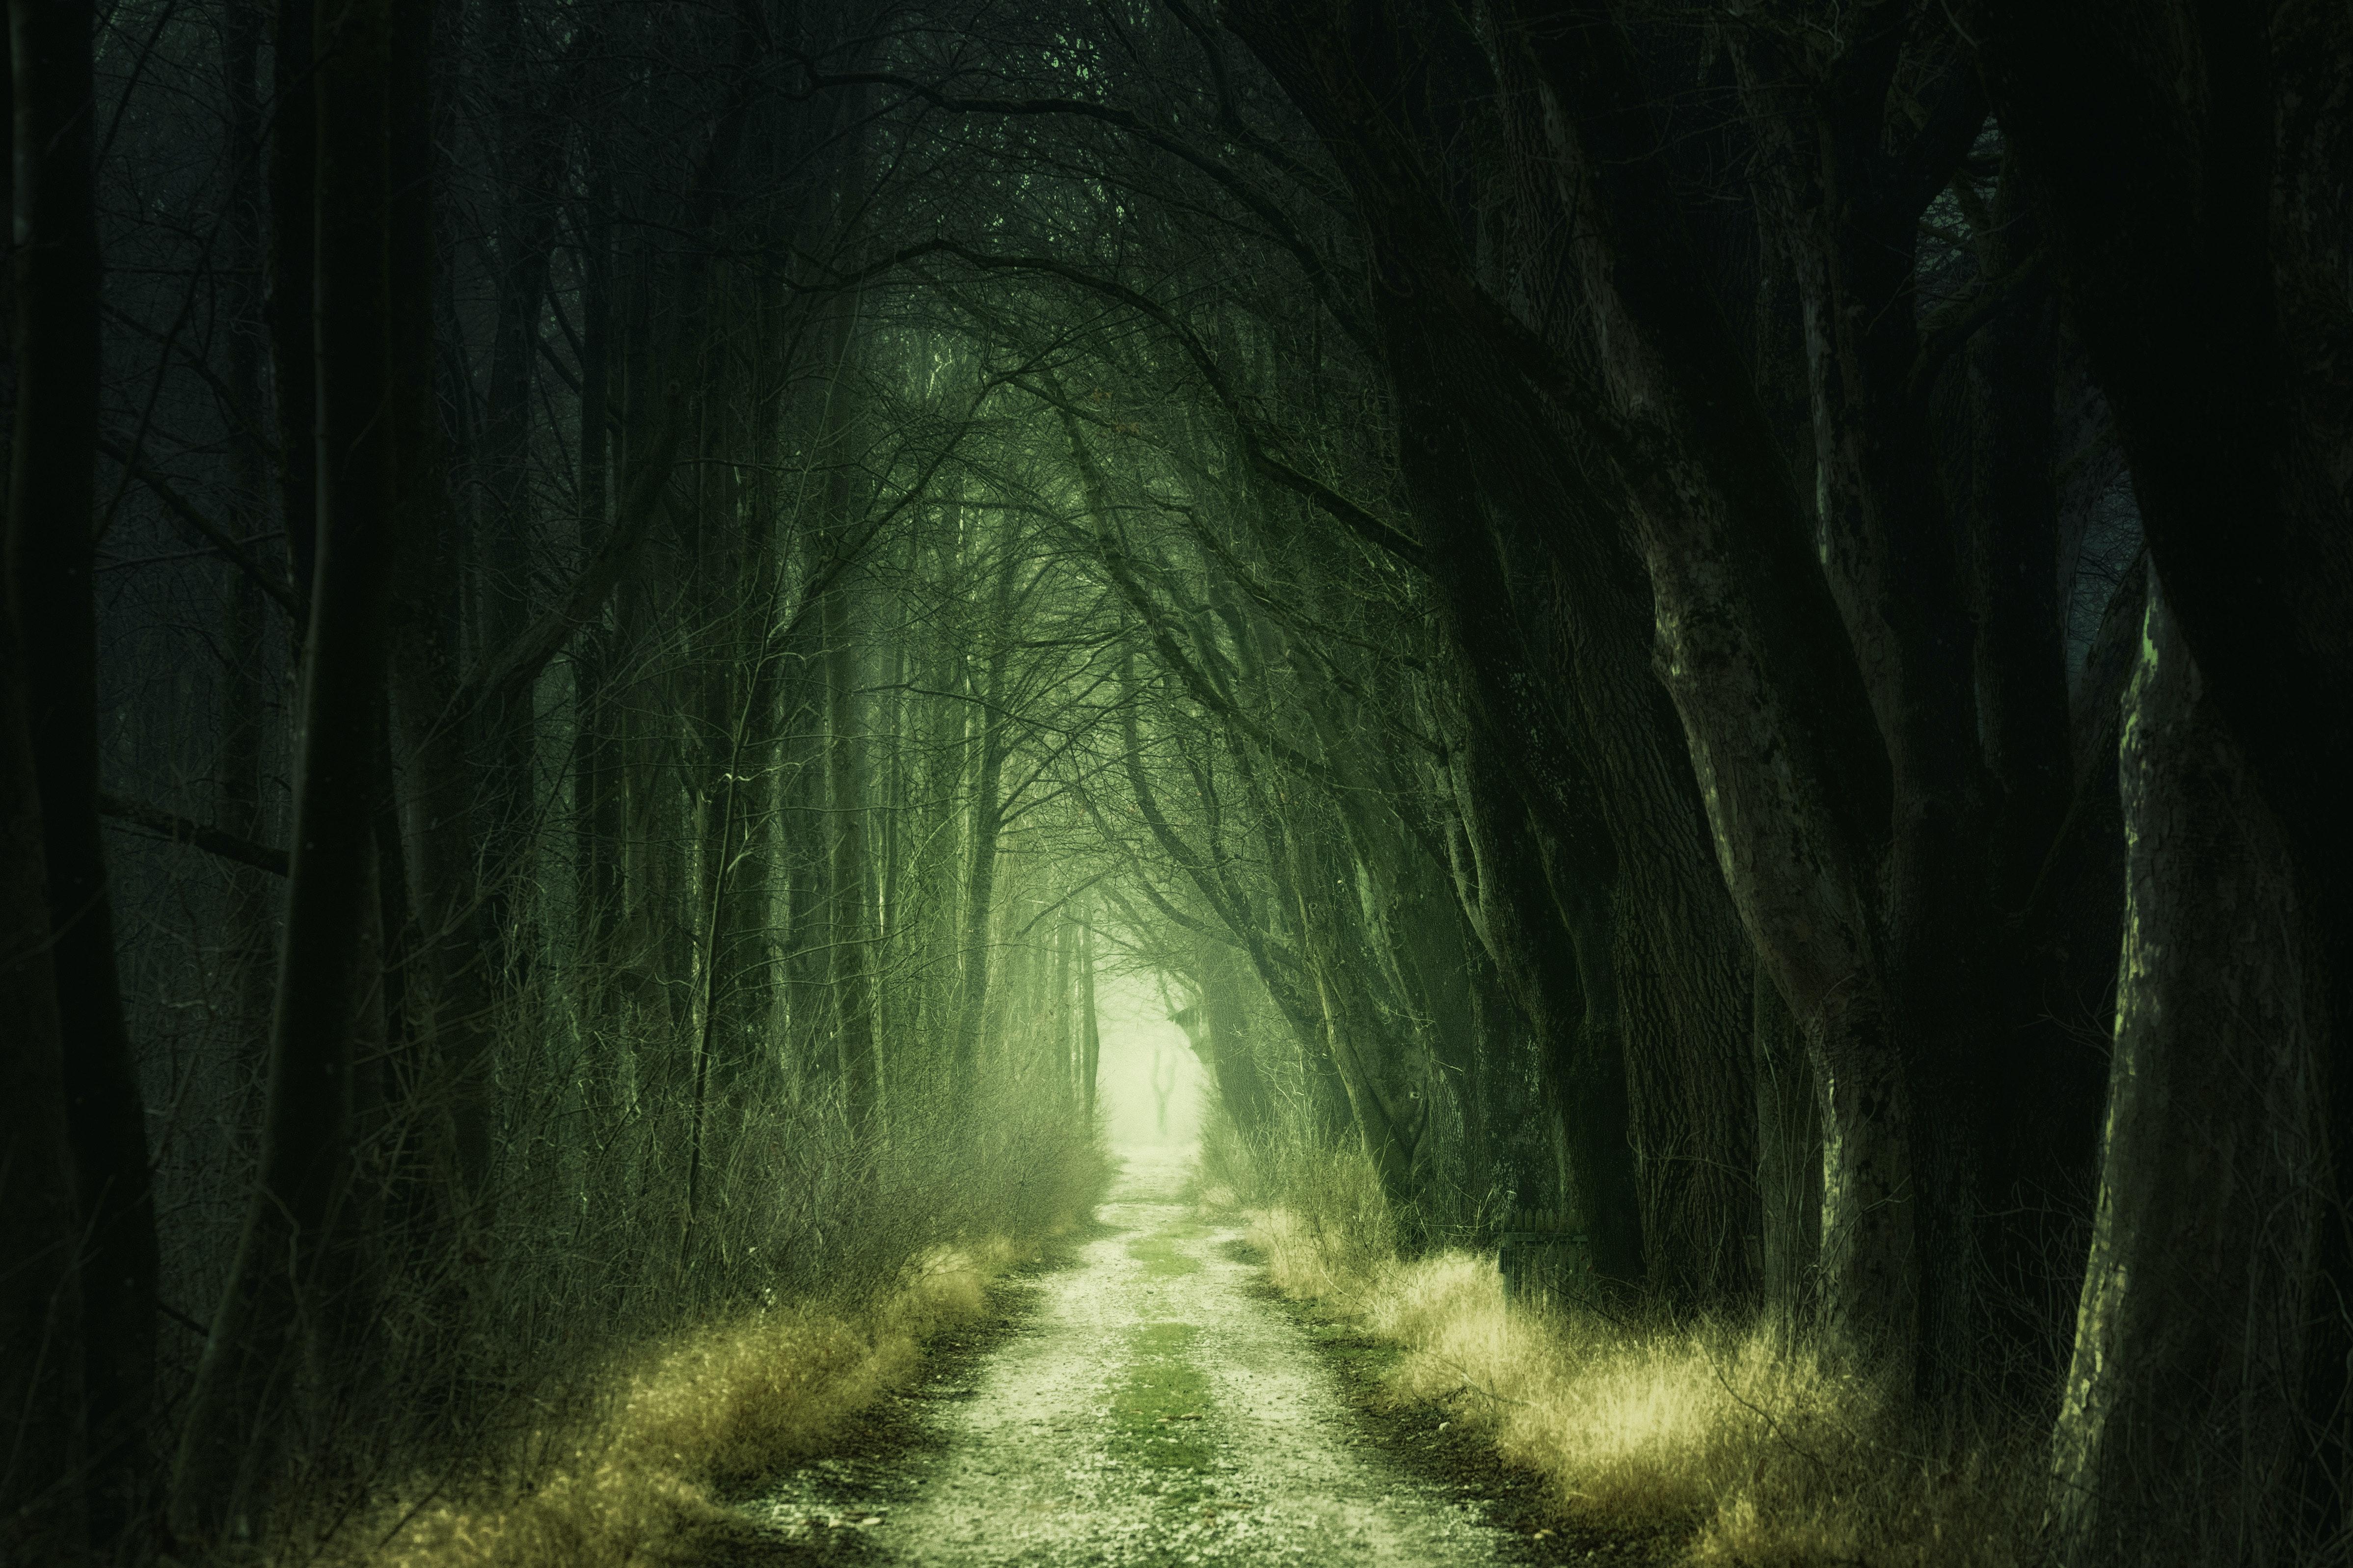 1000 Beautiful Dark Forest Photos 183 Pexels 183 Free Stock